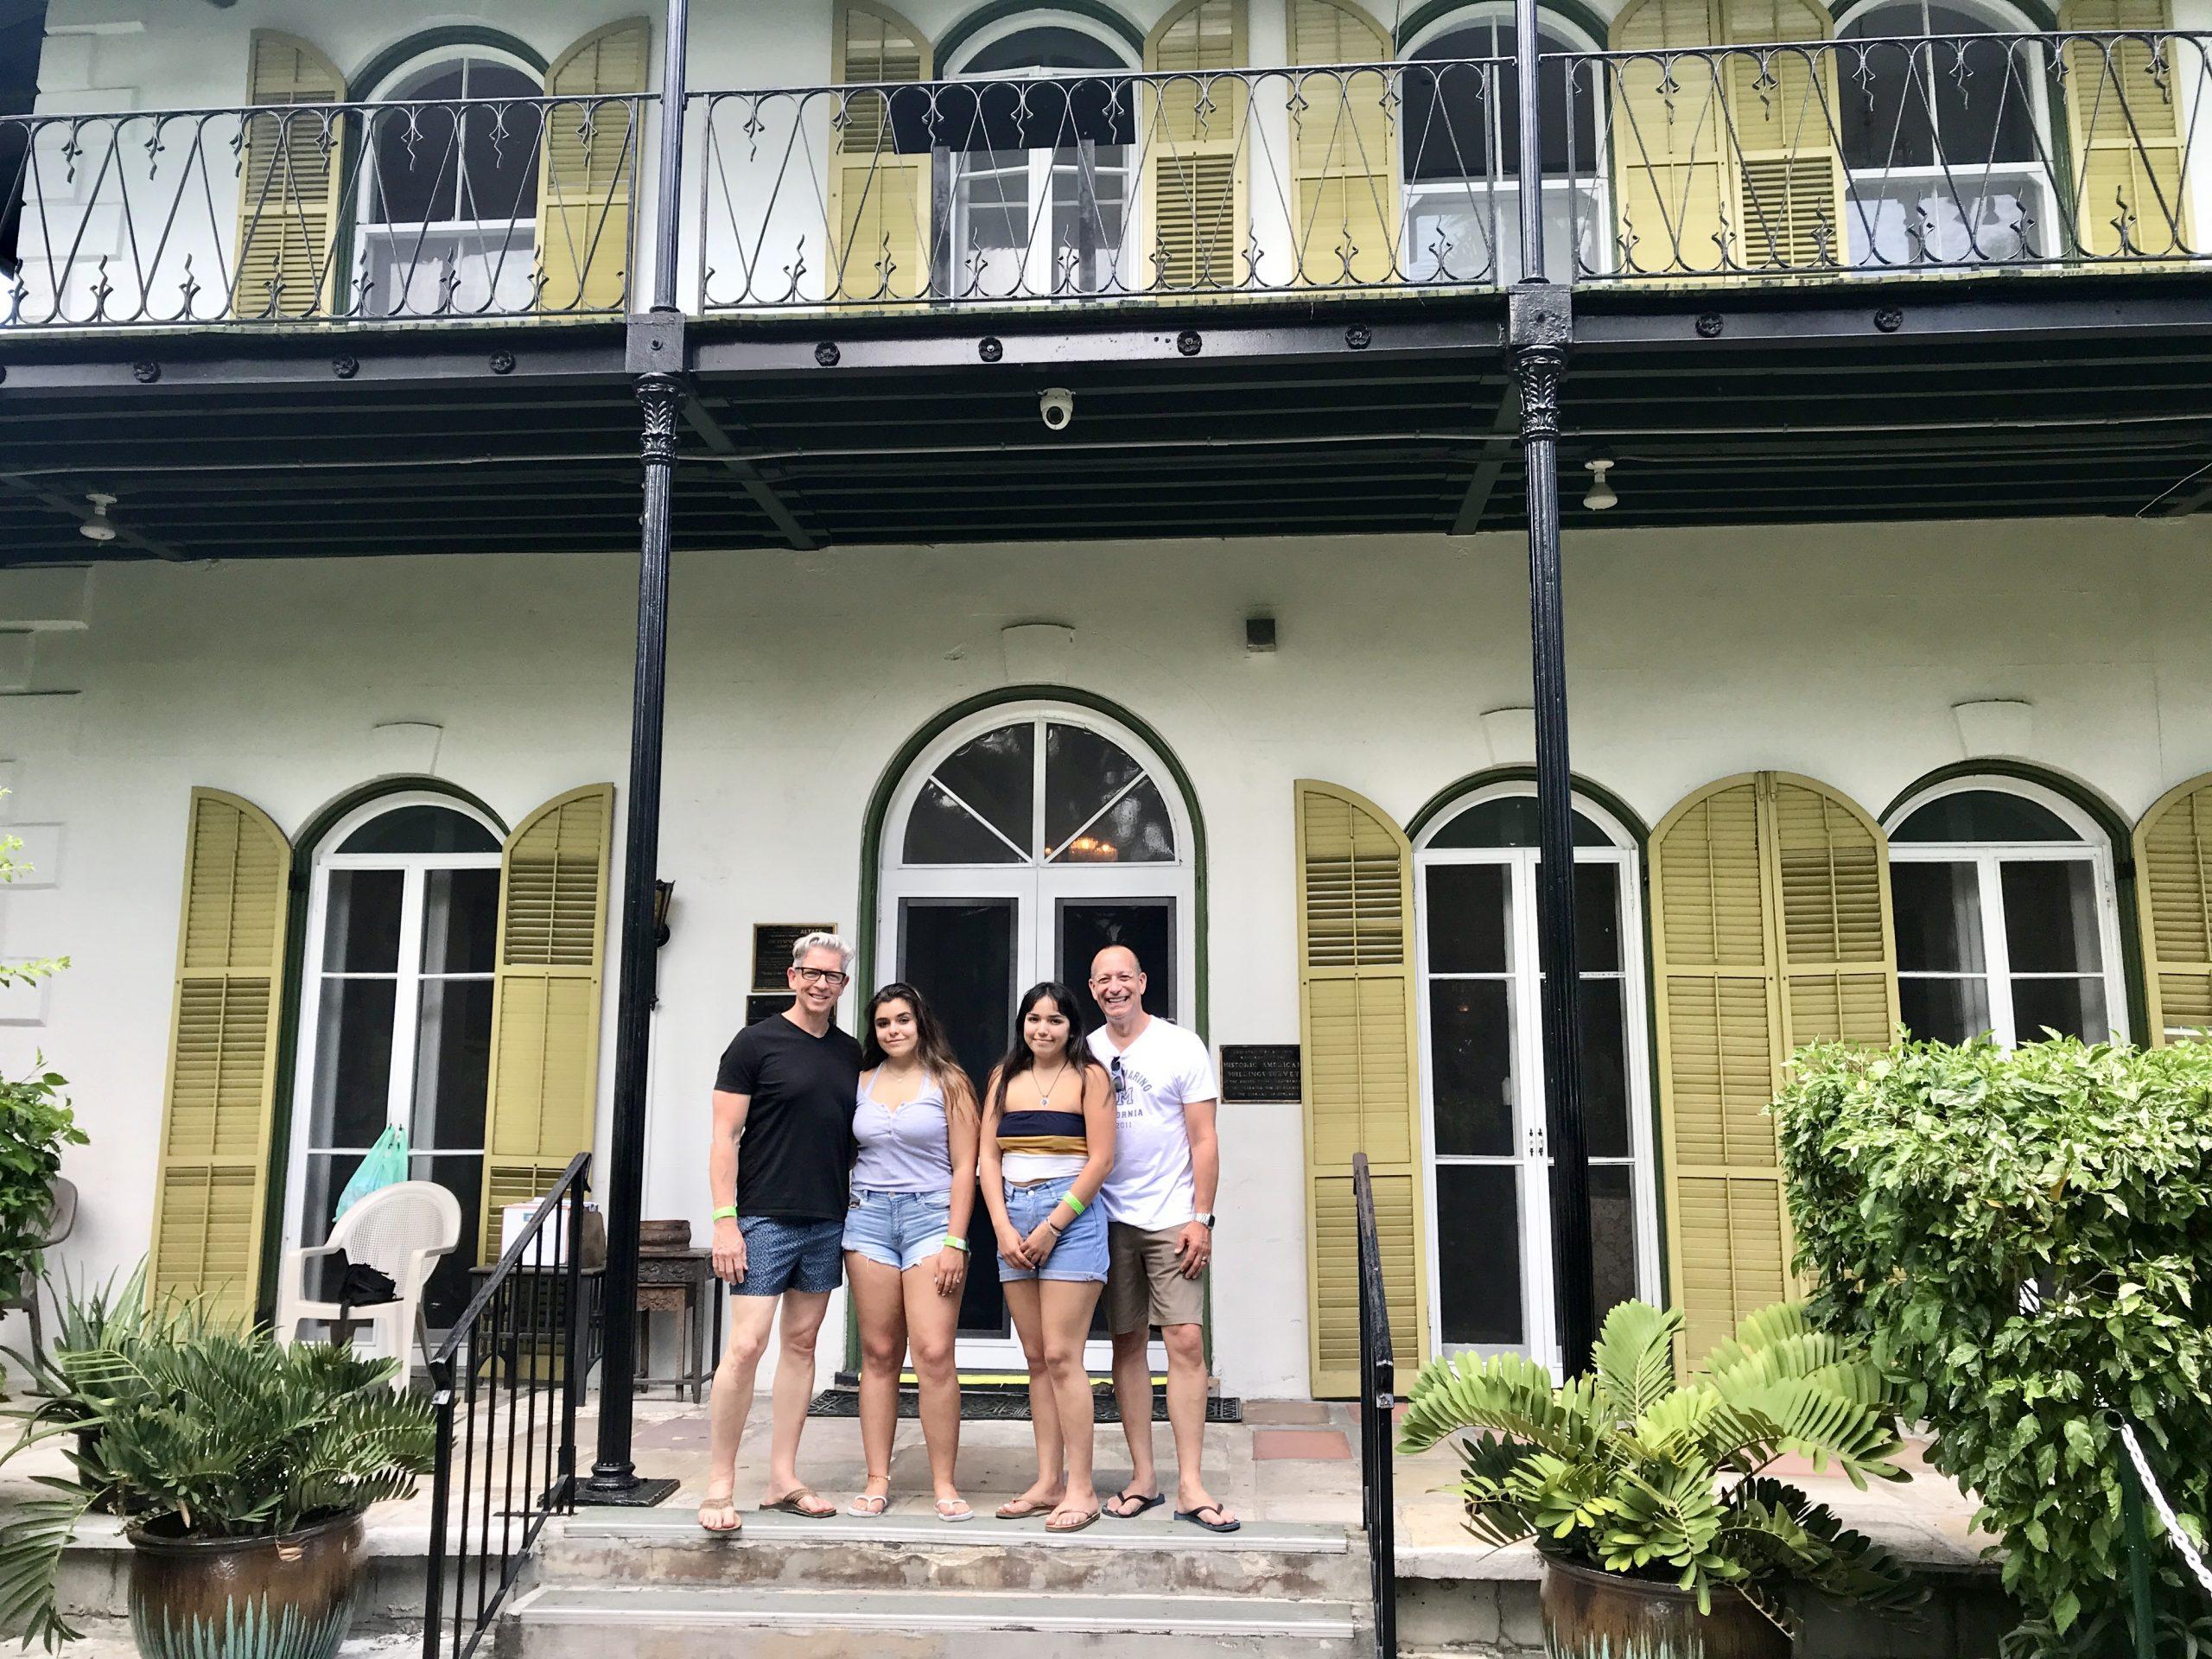 Hemingway House in Key West, Florida